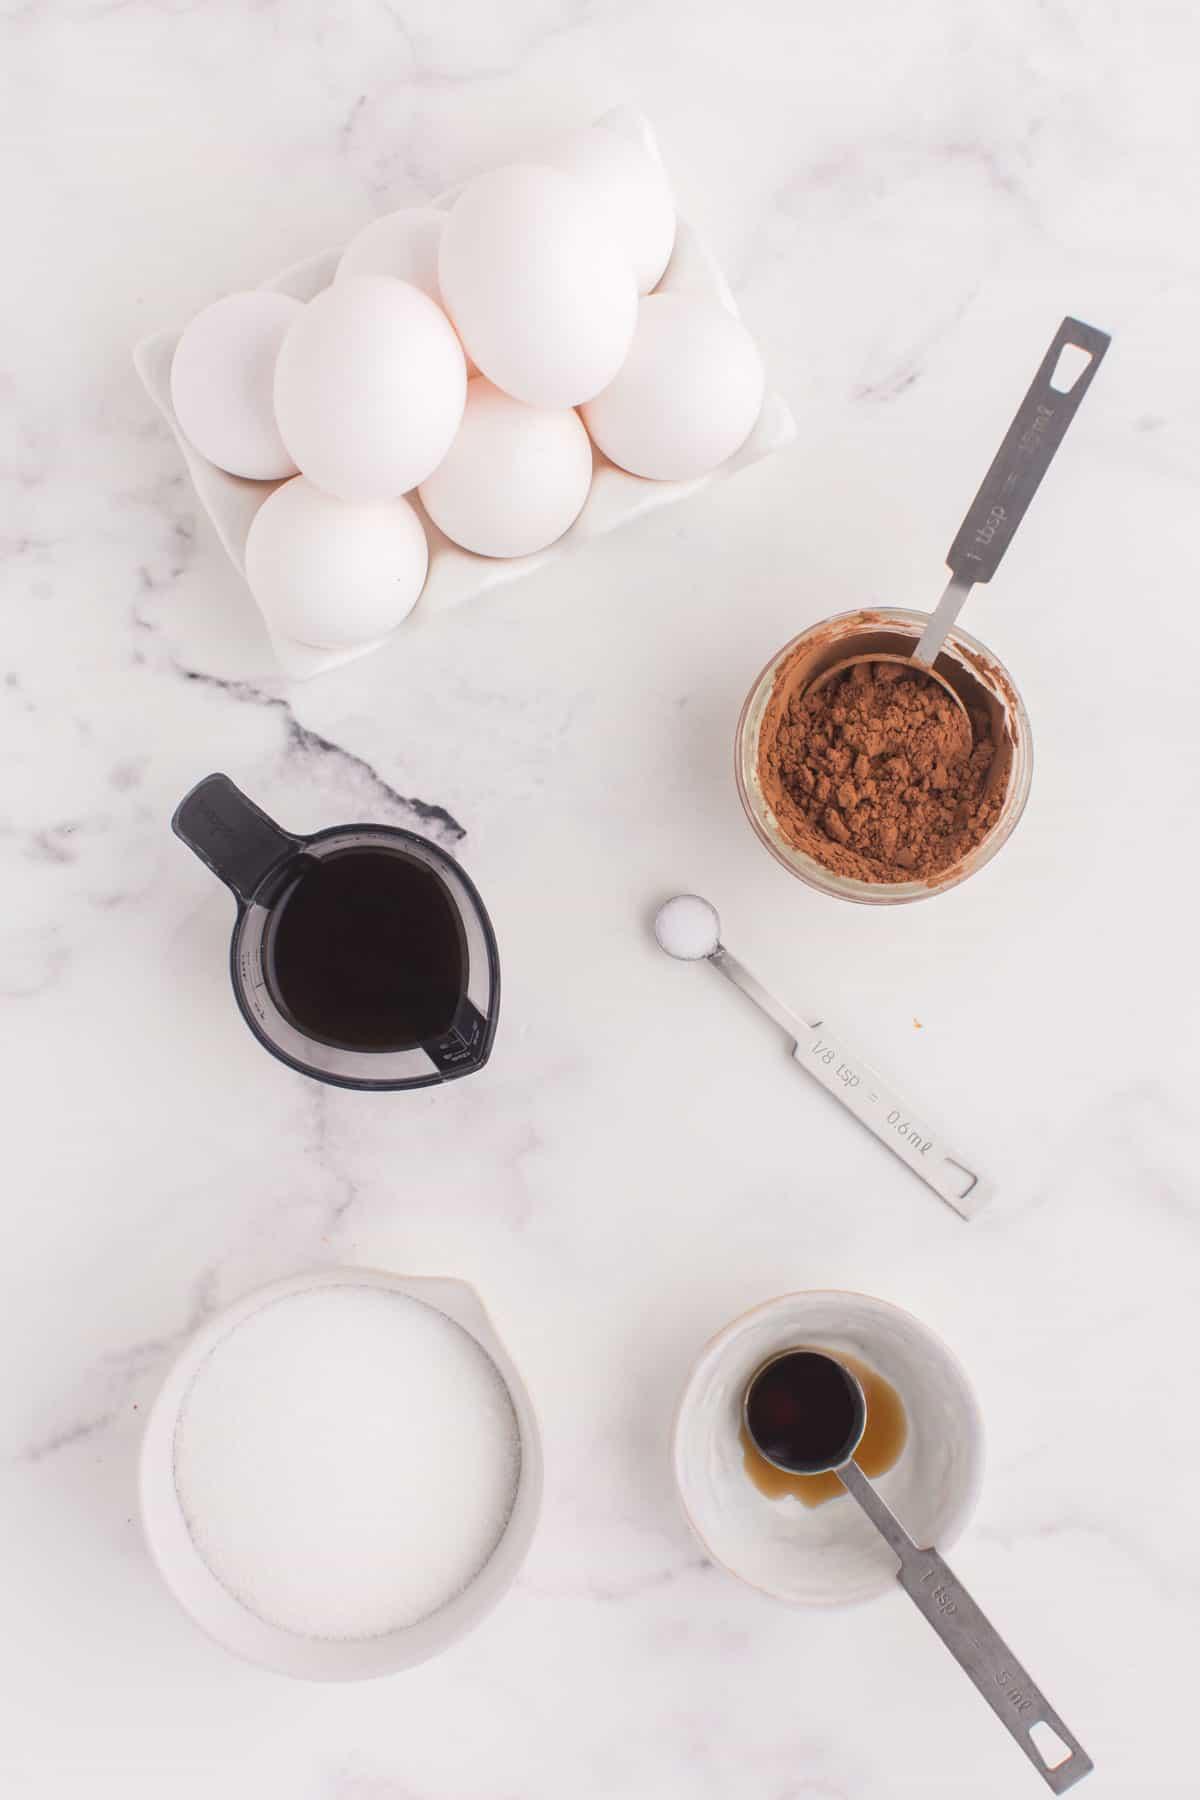 Eggs, cocoa powder and sugar in bowls